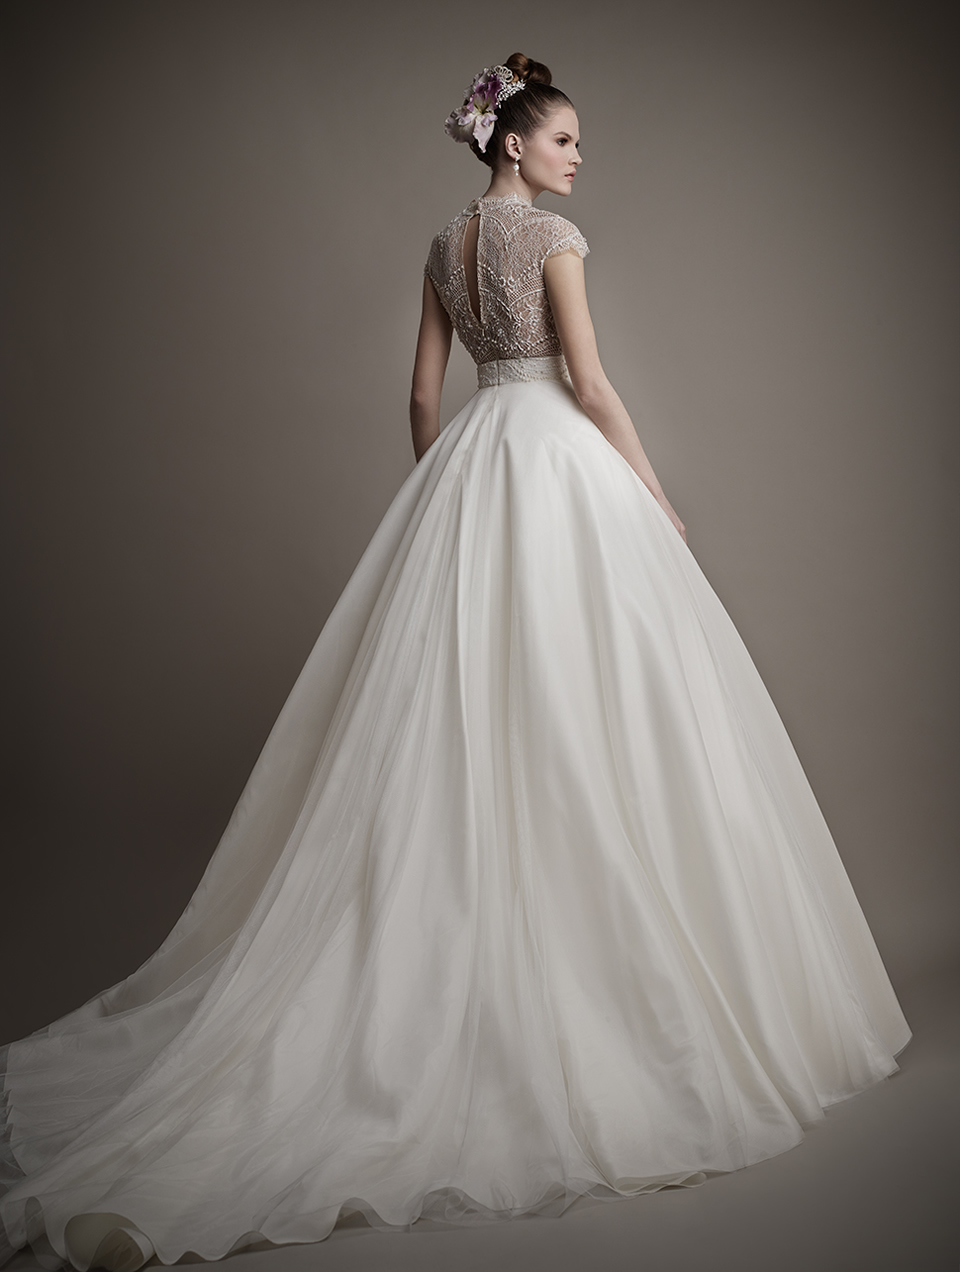 Ersa atelier 2015 bridal collection style to the aisle for Ersa atelier wedding dress